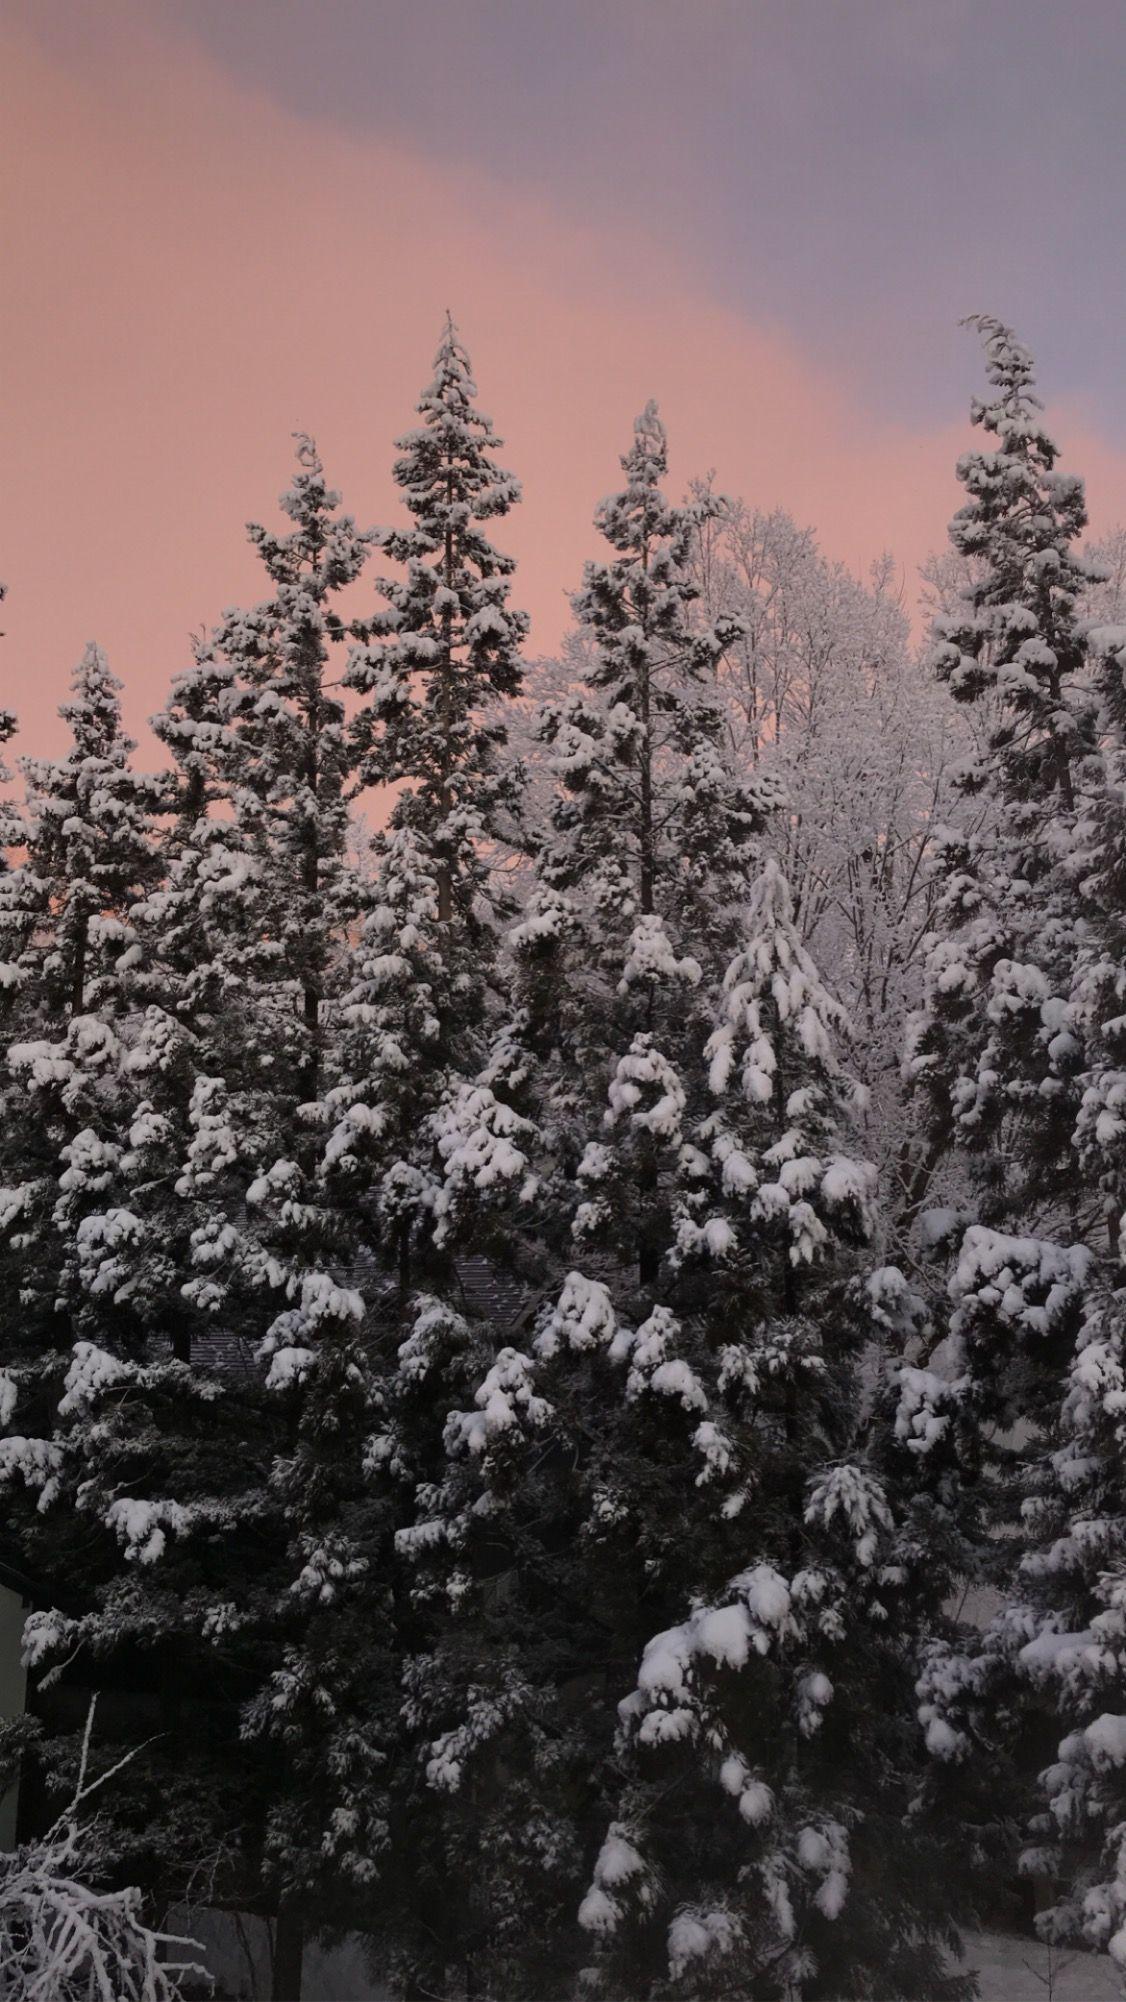 Sunrise in Hakuba #view #snow #trees #forest #pinksky #sunrise